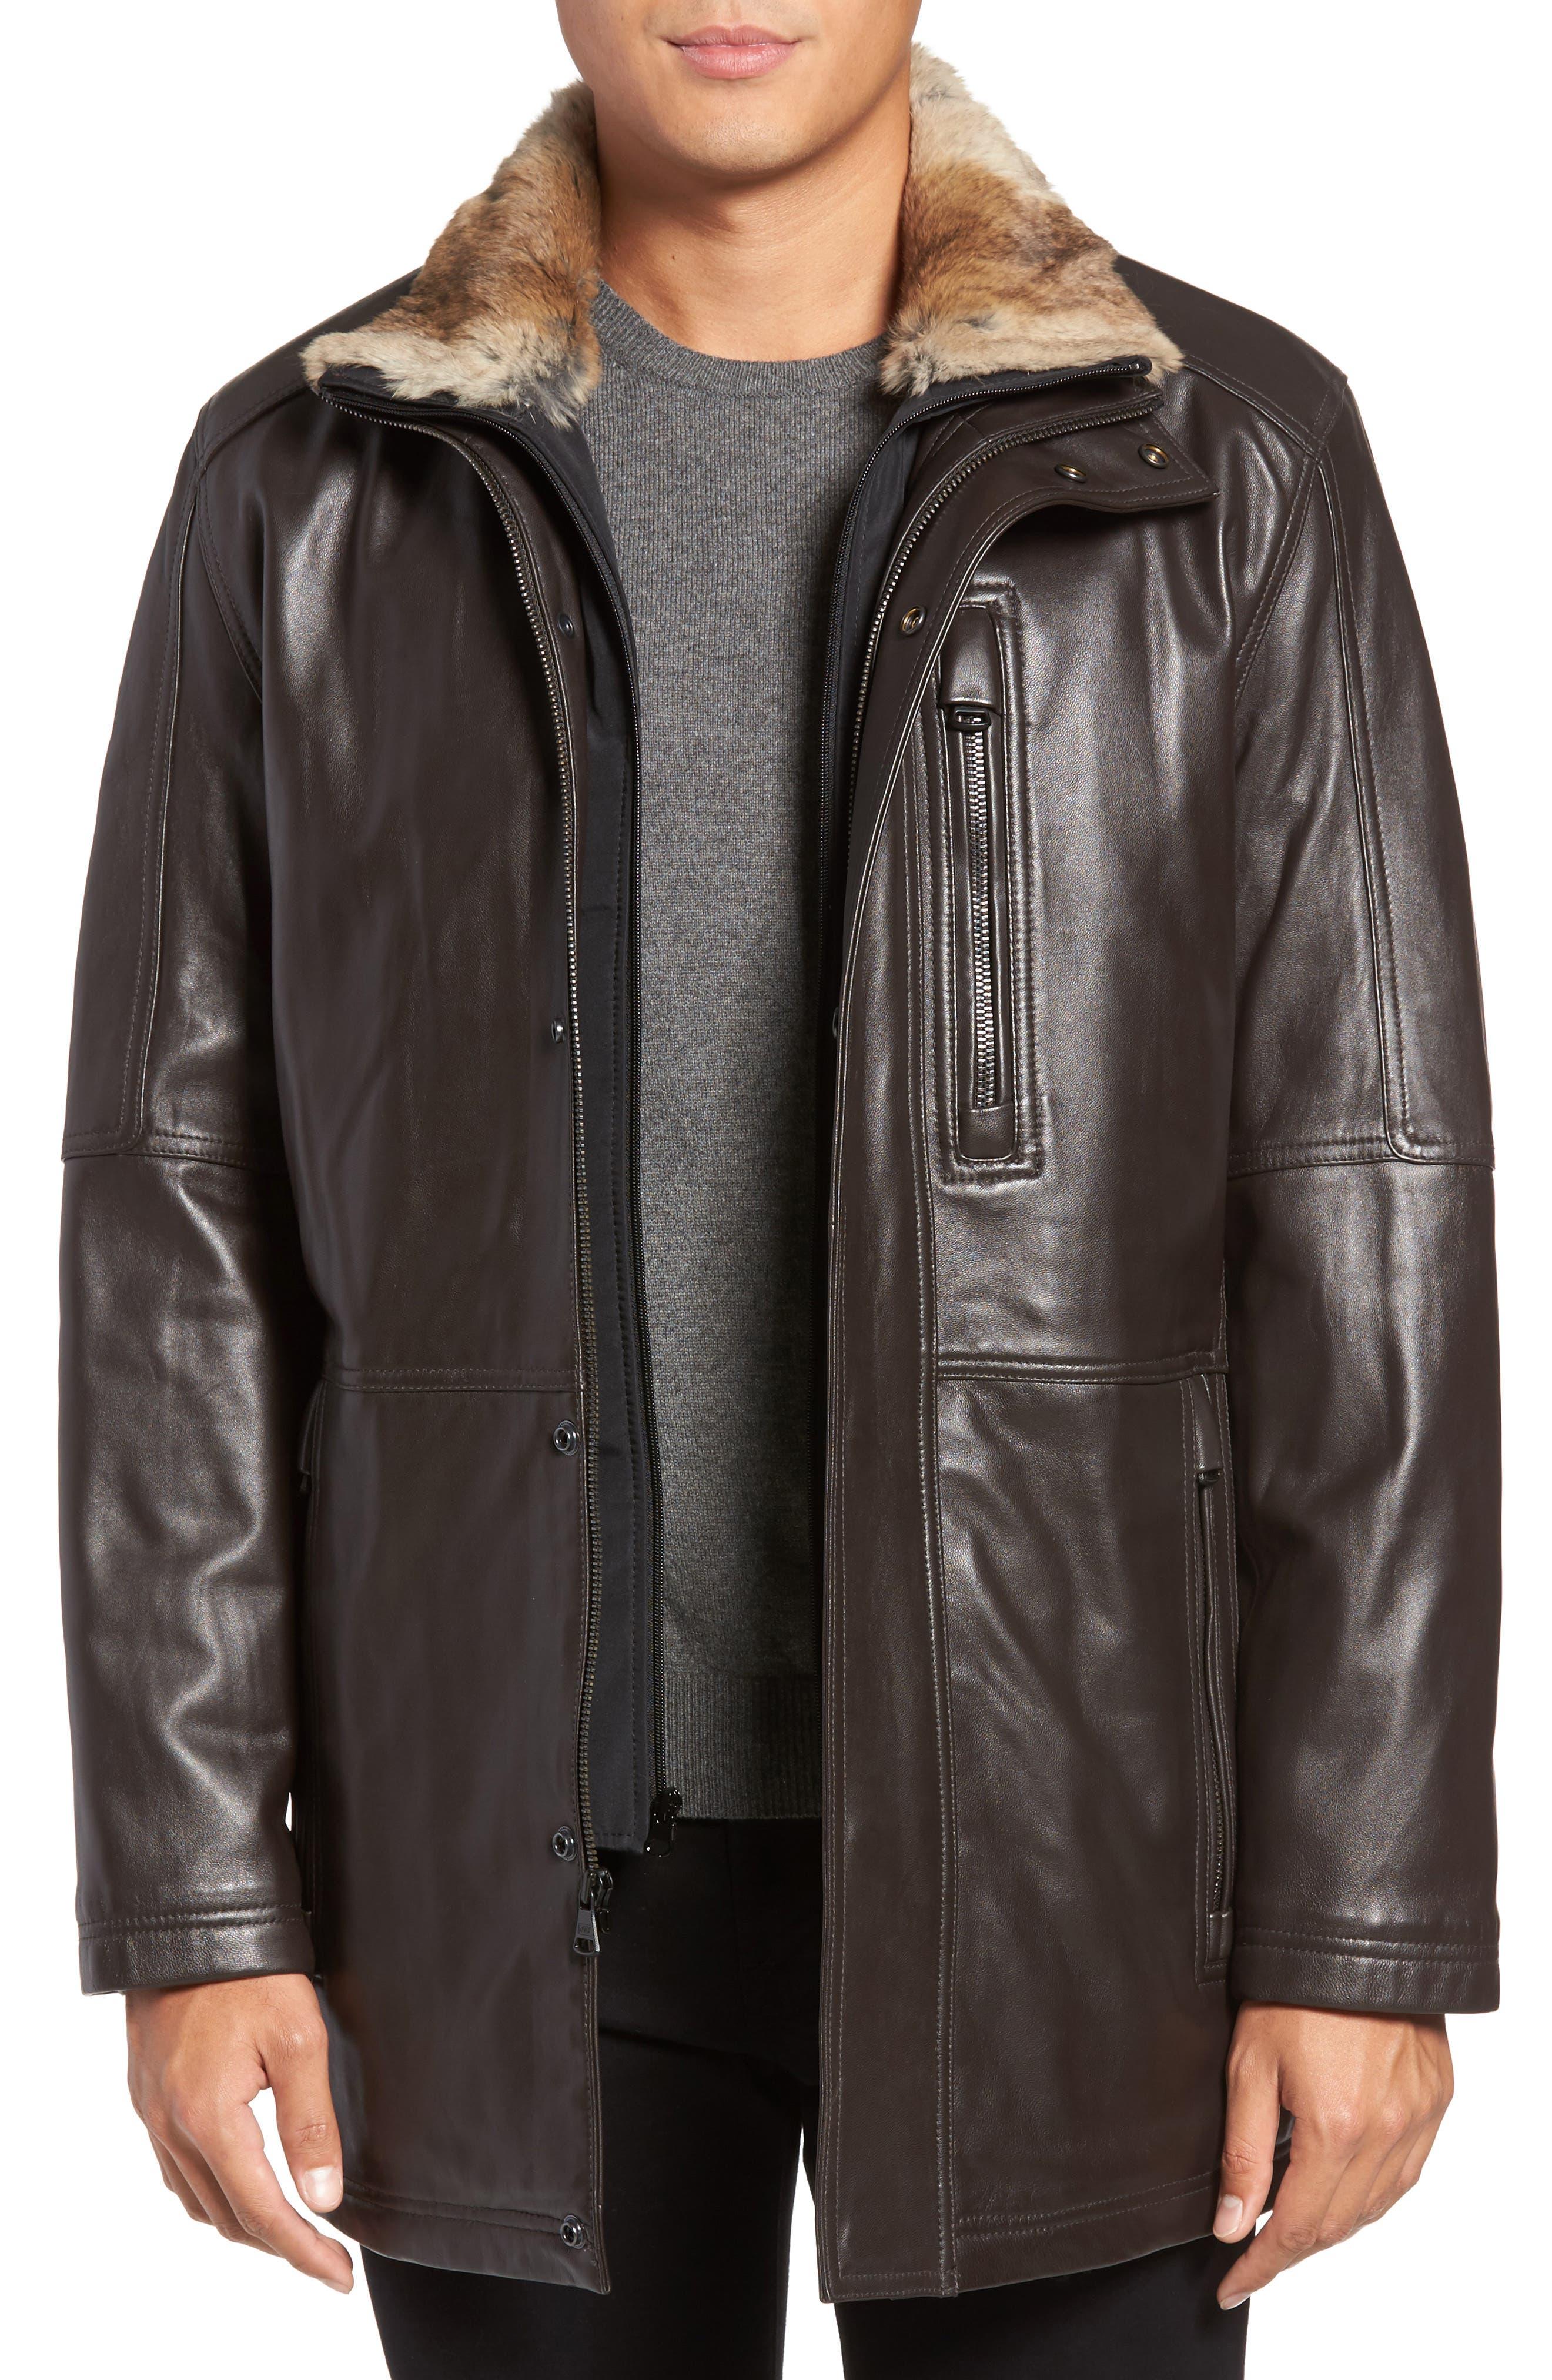 Middlebury Leather Car Coat with Genuine Rabbit Fur Trim,                         Main,                         color, Espresso